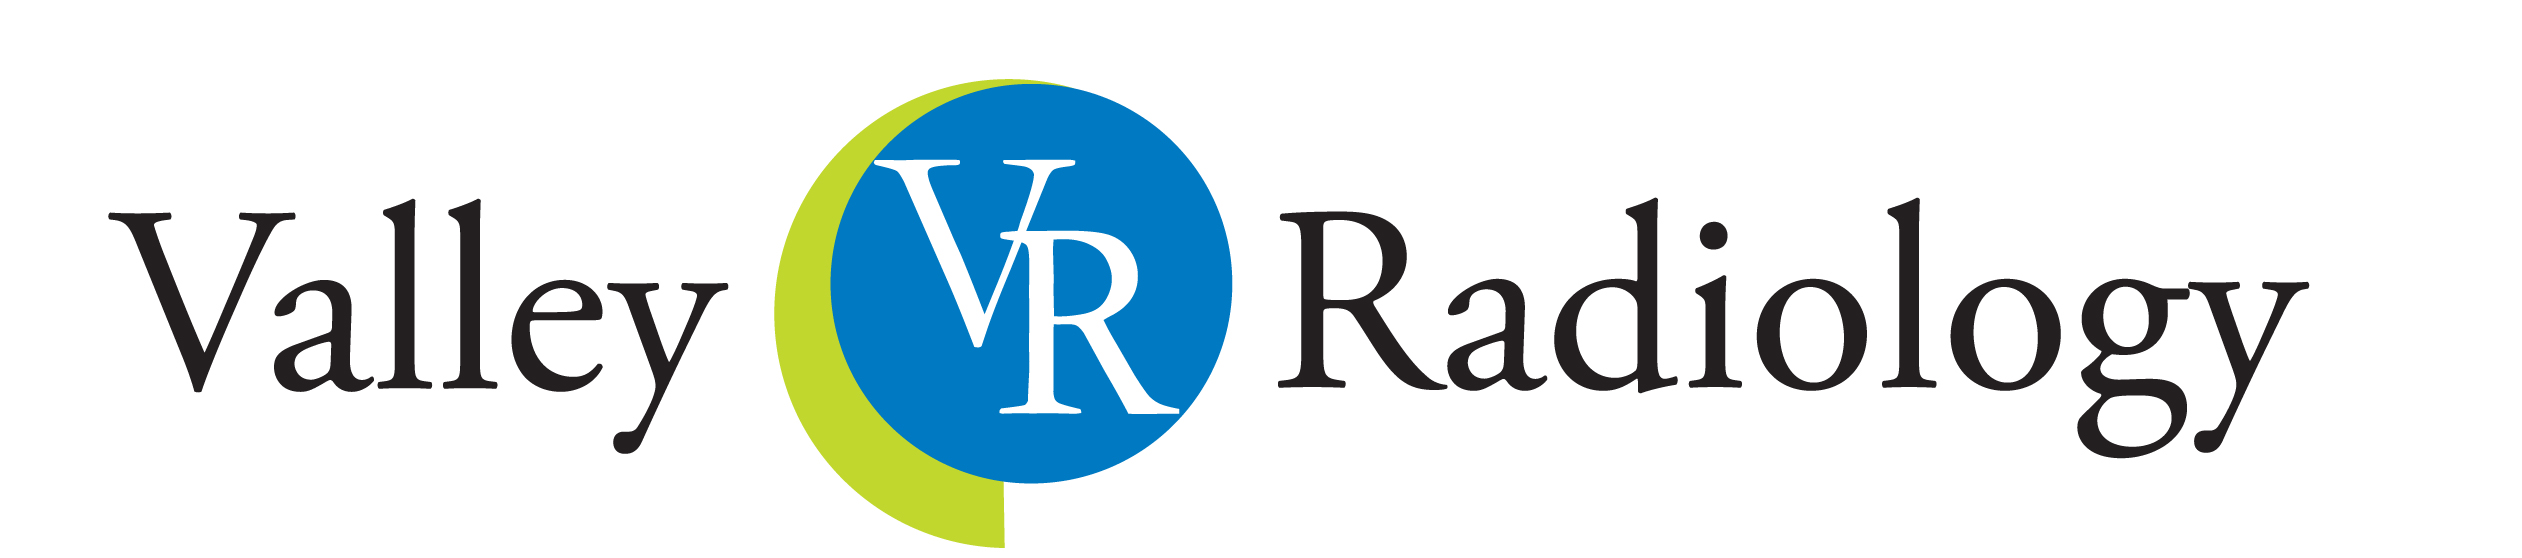 Valley Radiology